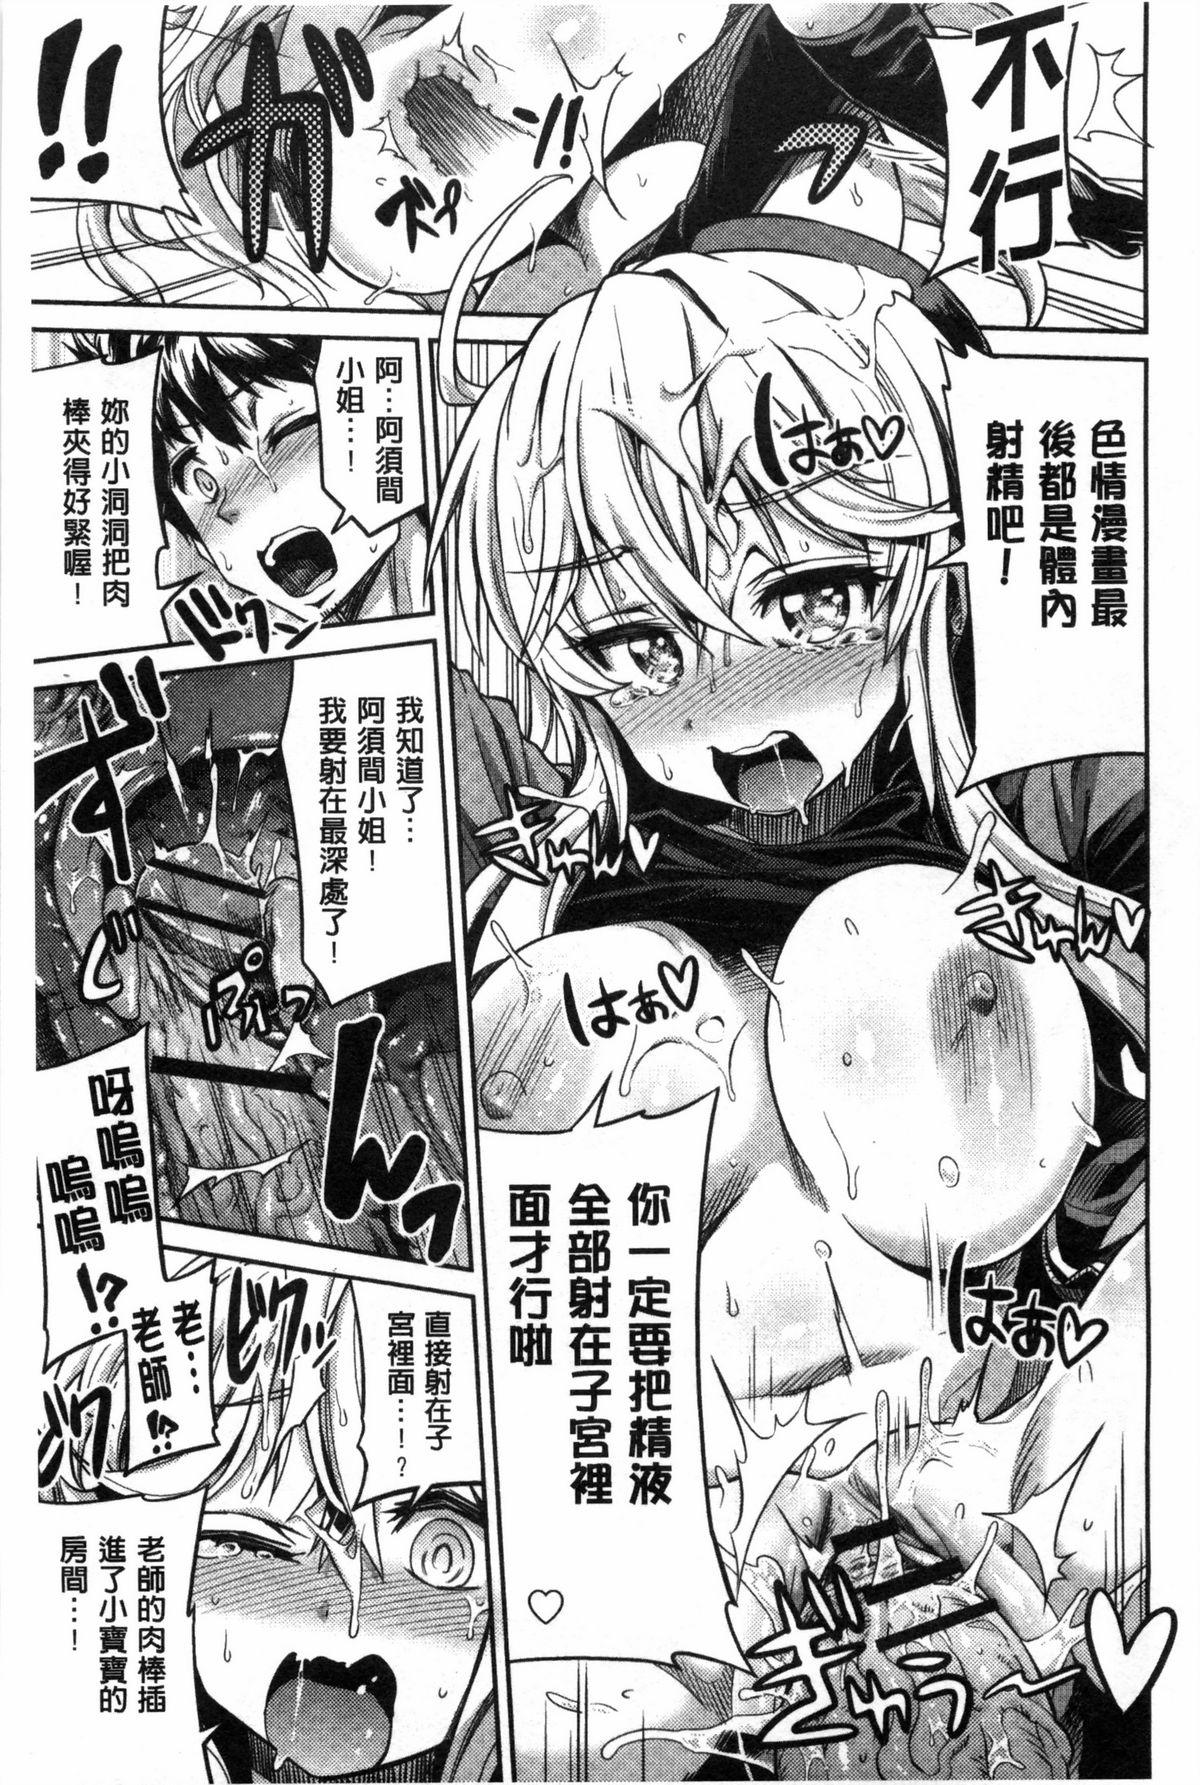 Man x Koi - Ero Manga de Hajimaru Koi no Plot   A漫×戀情 由情色漫畫所萌生的戀之物語 27